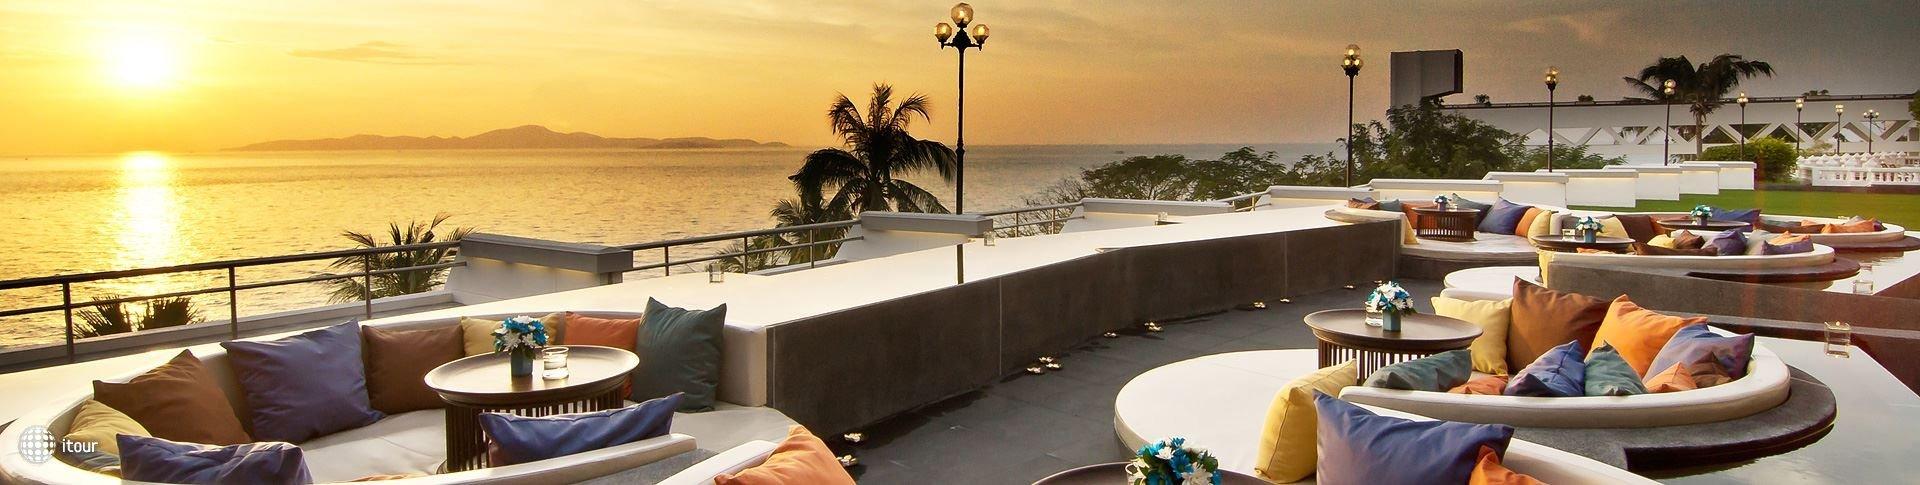 Royal Cliff Beach Hotel 3